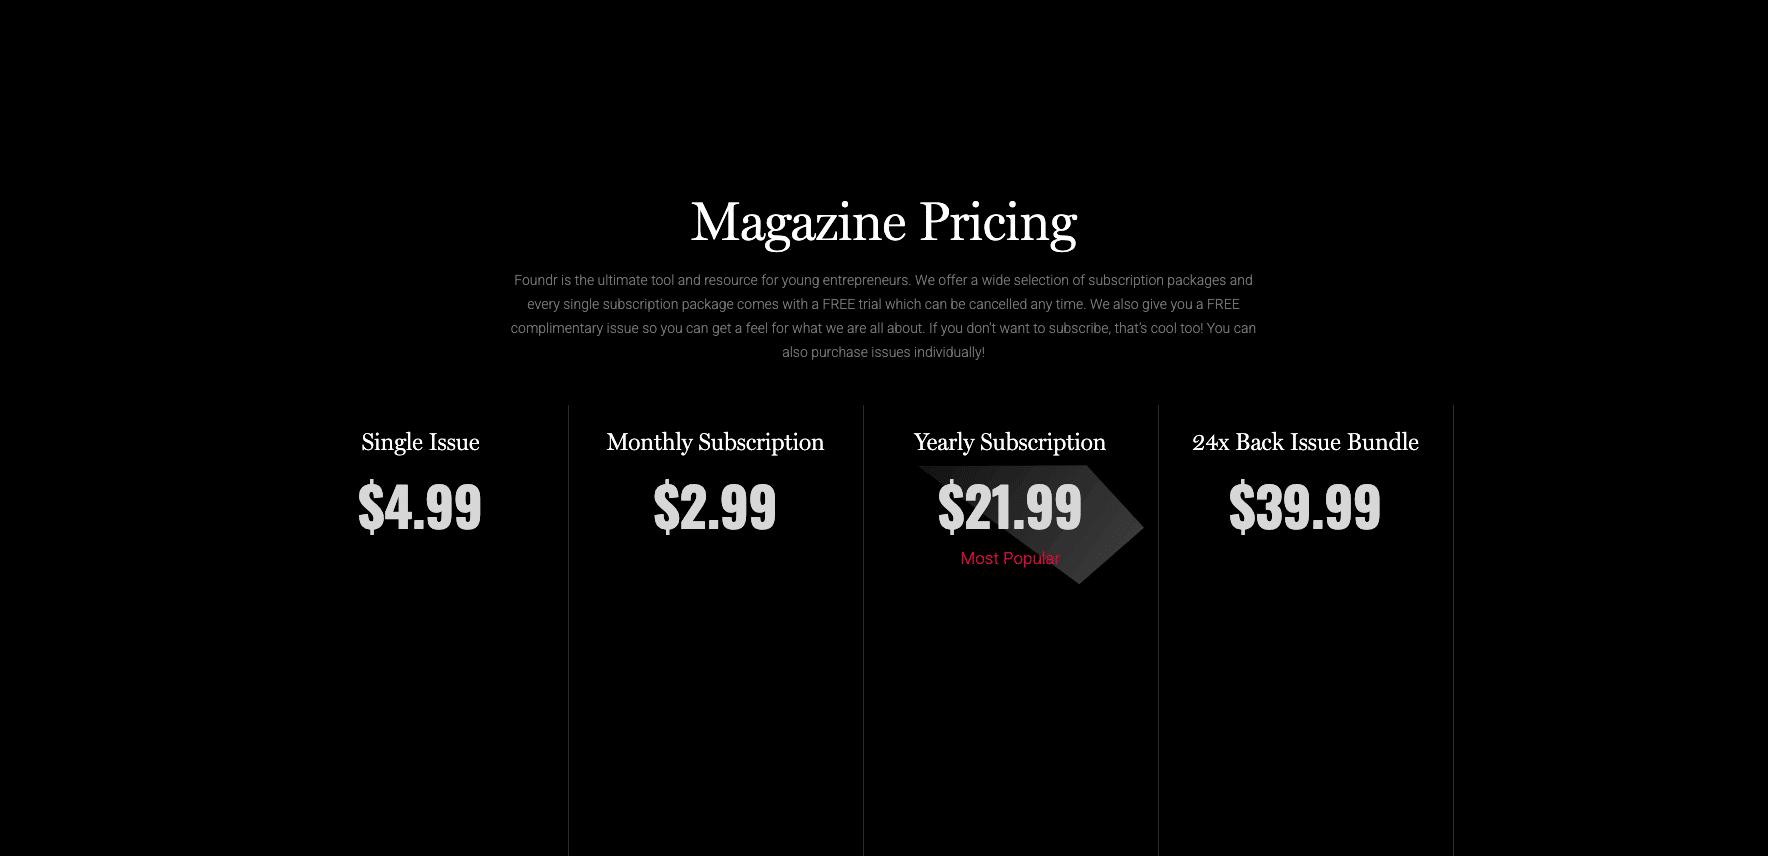 Foundr Magazine Pricing